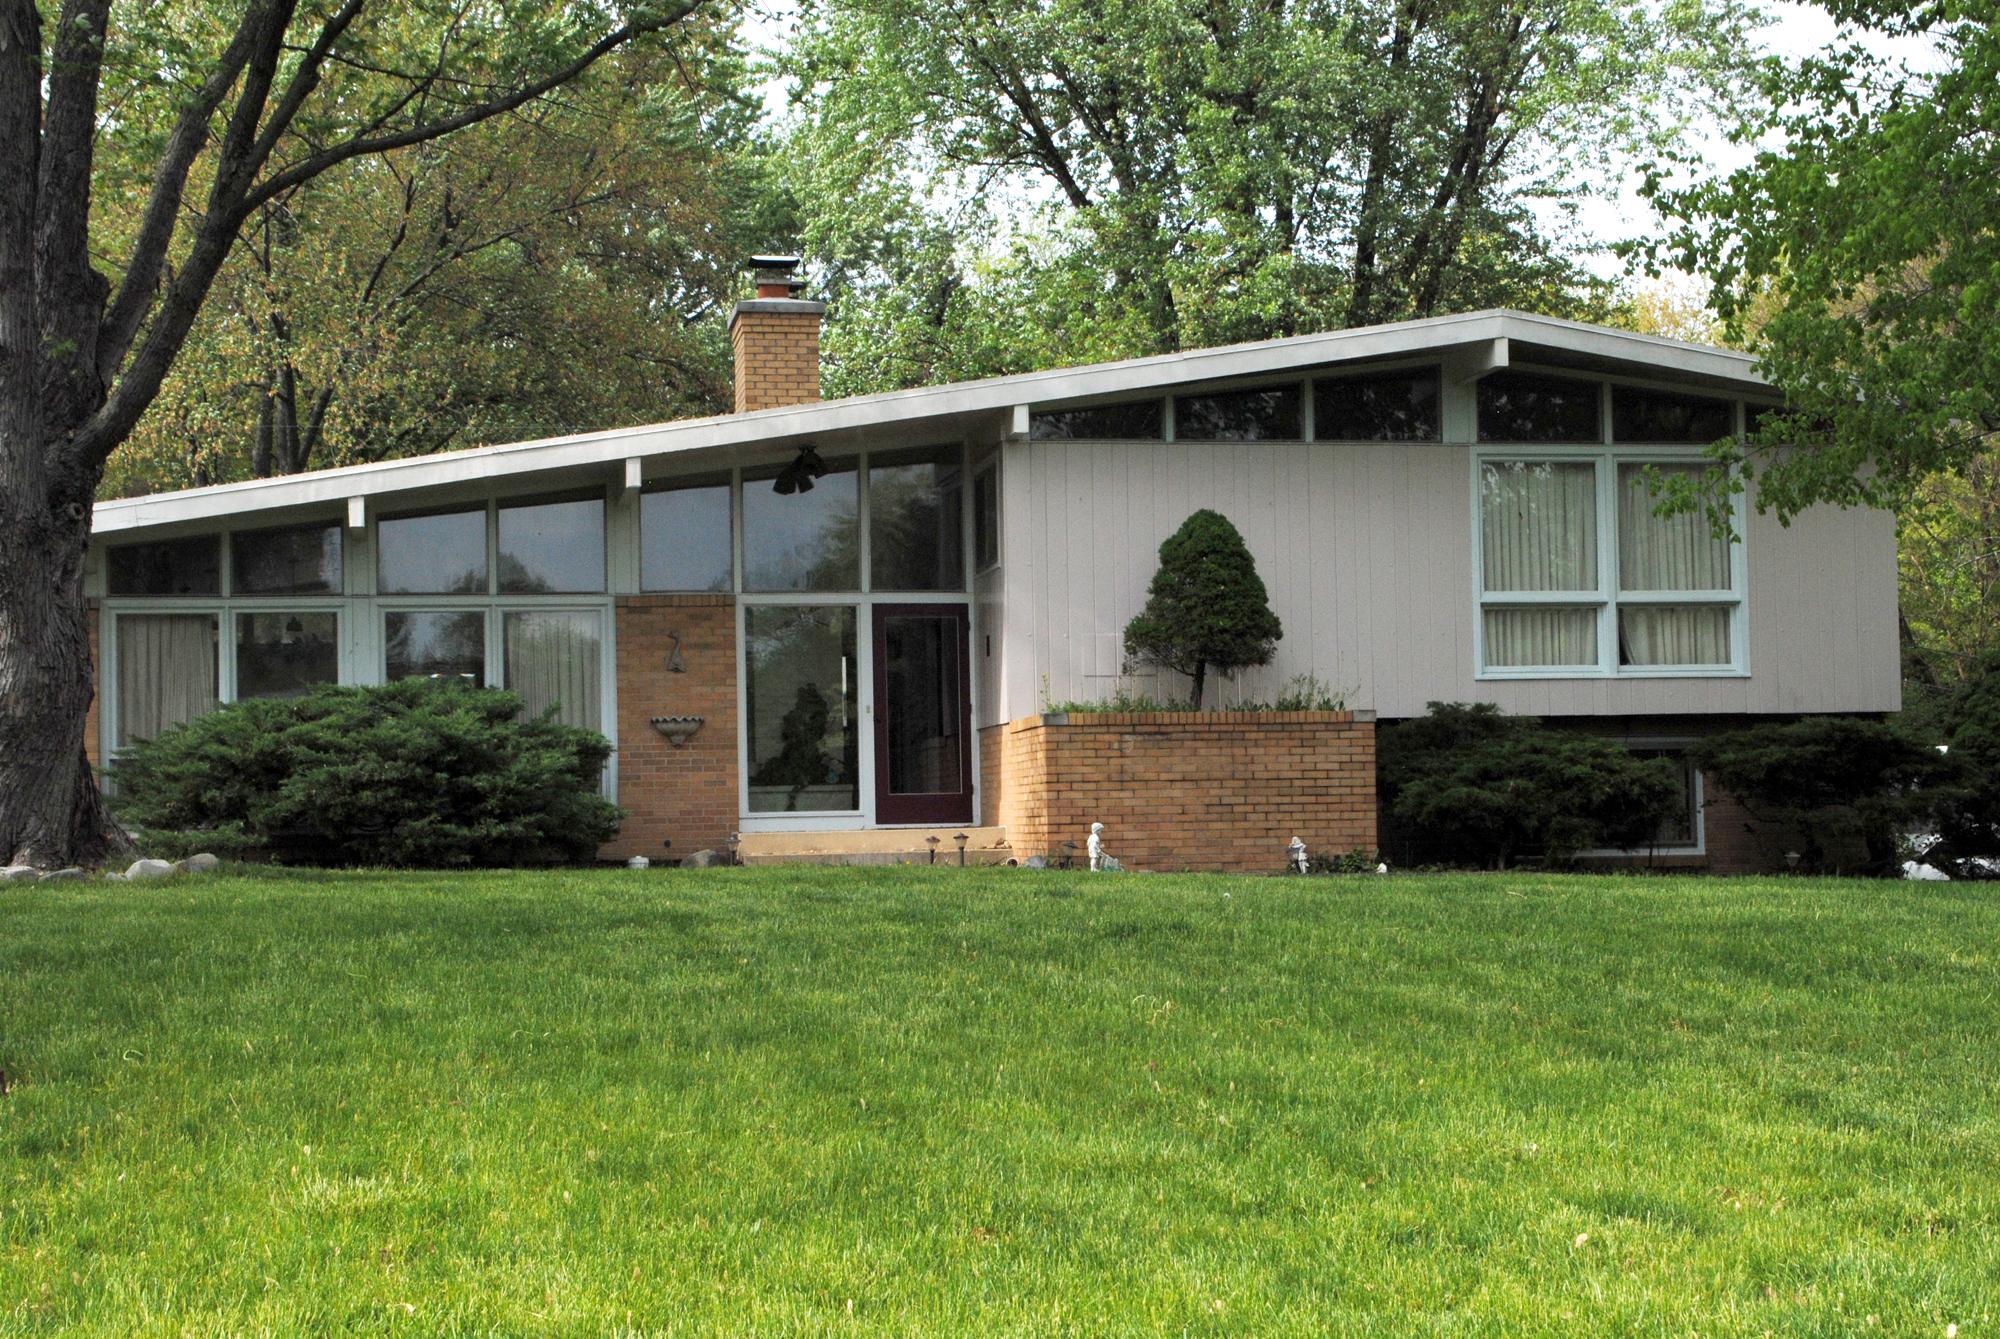 Avriel Shull designed the homes in Carmel's Thornhurst neighborhood near Main Street and Guilford Road. (Staff photo)